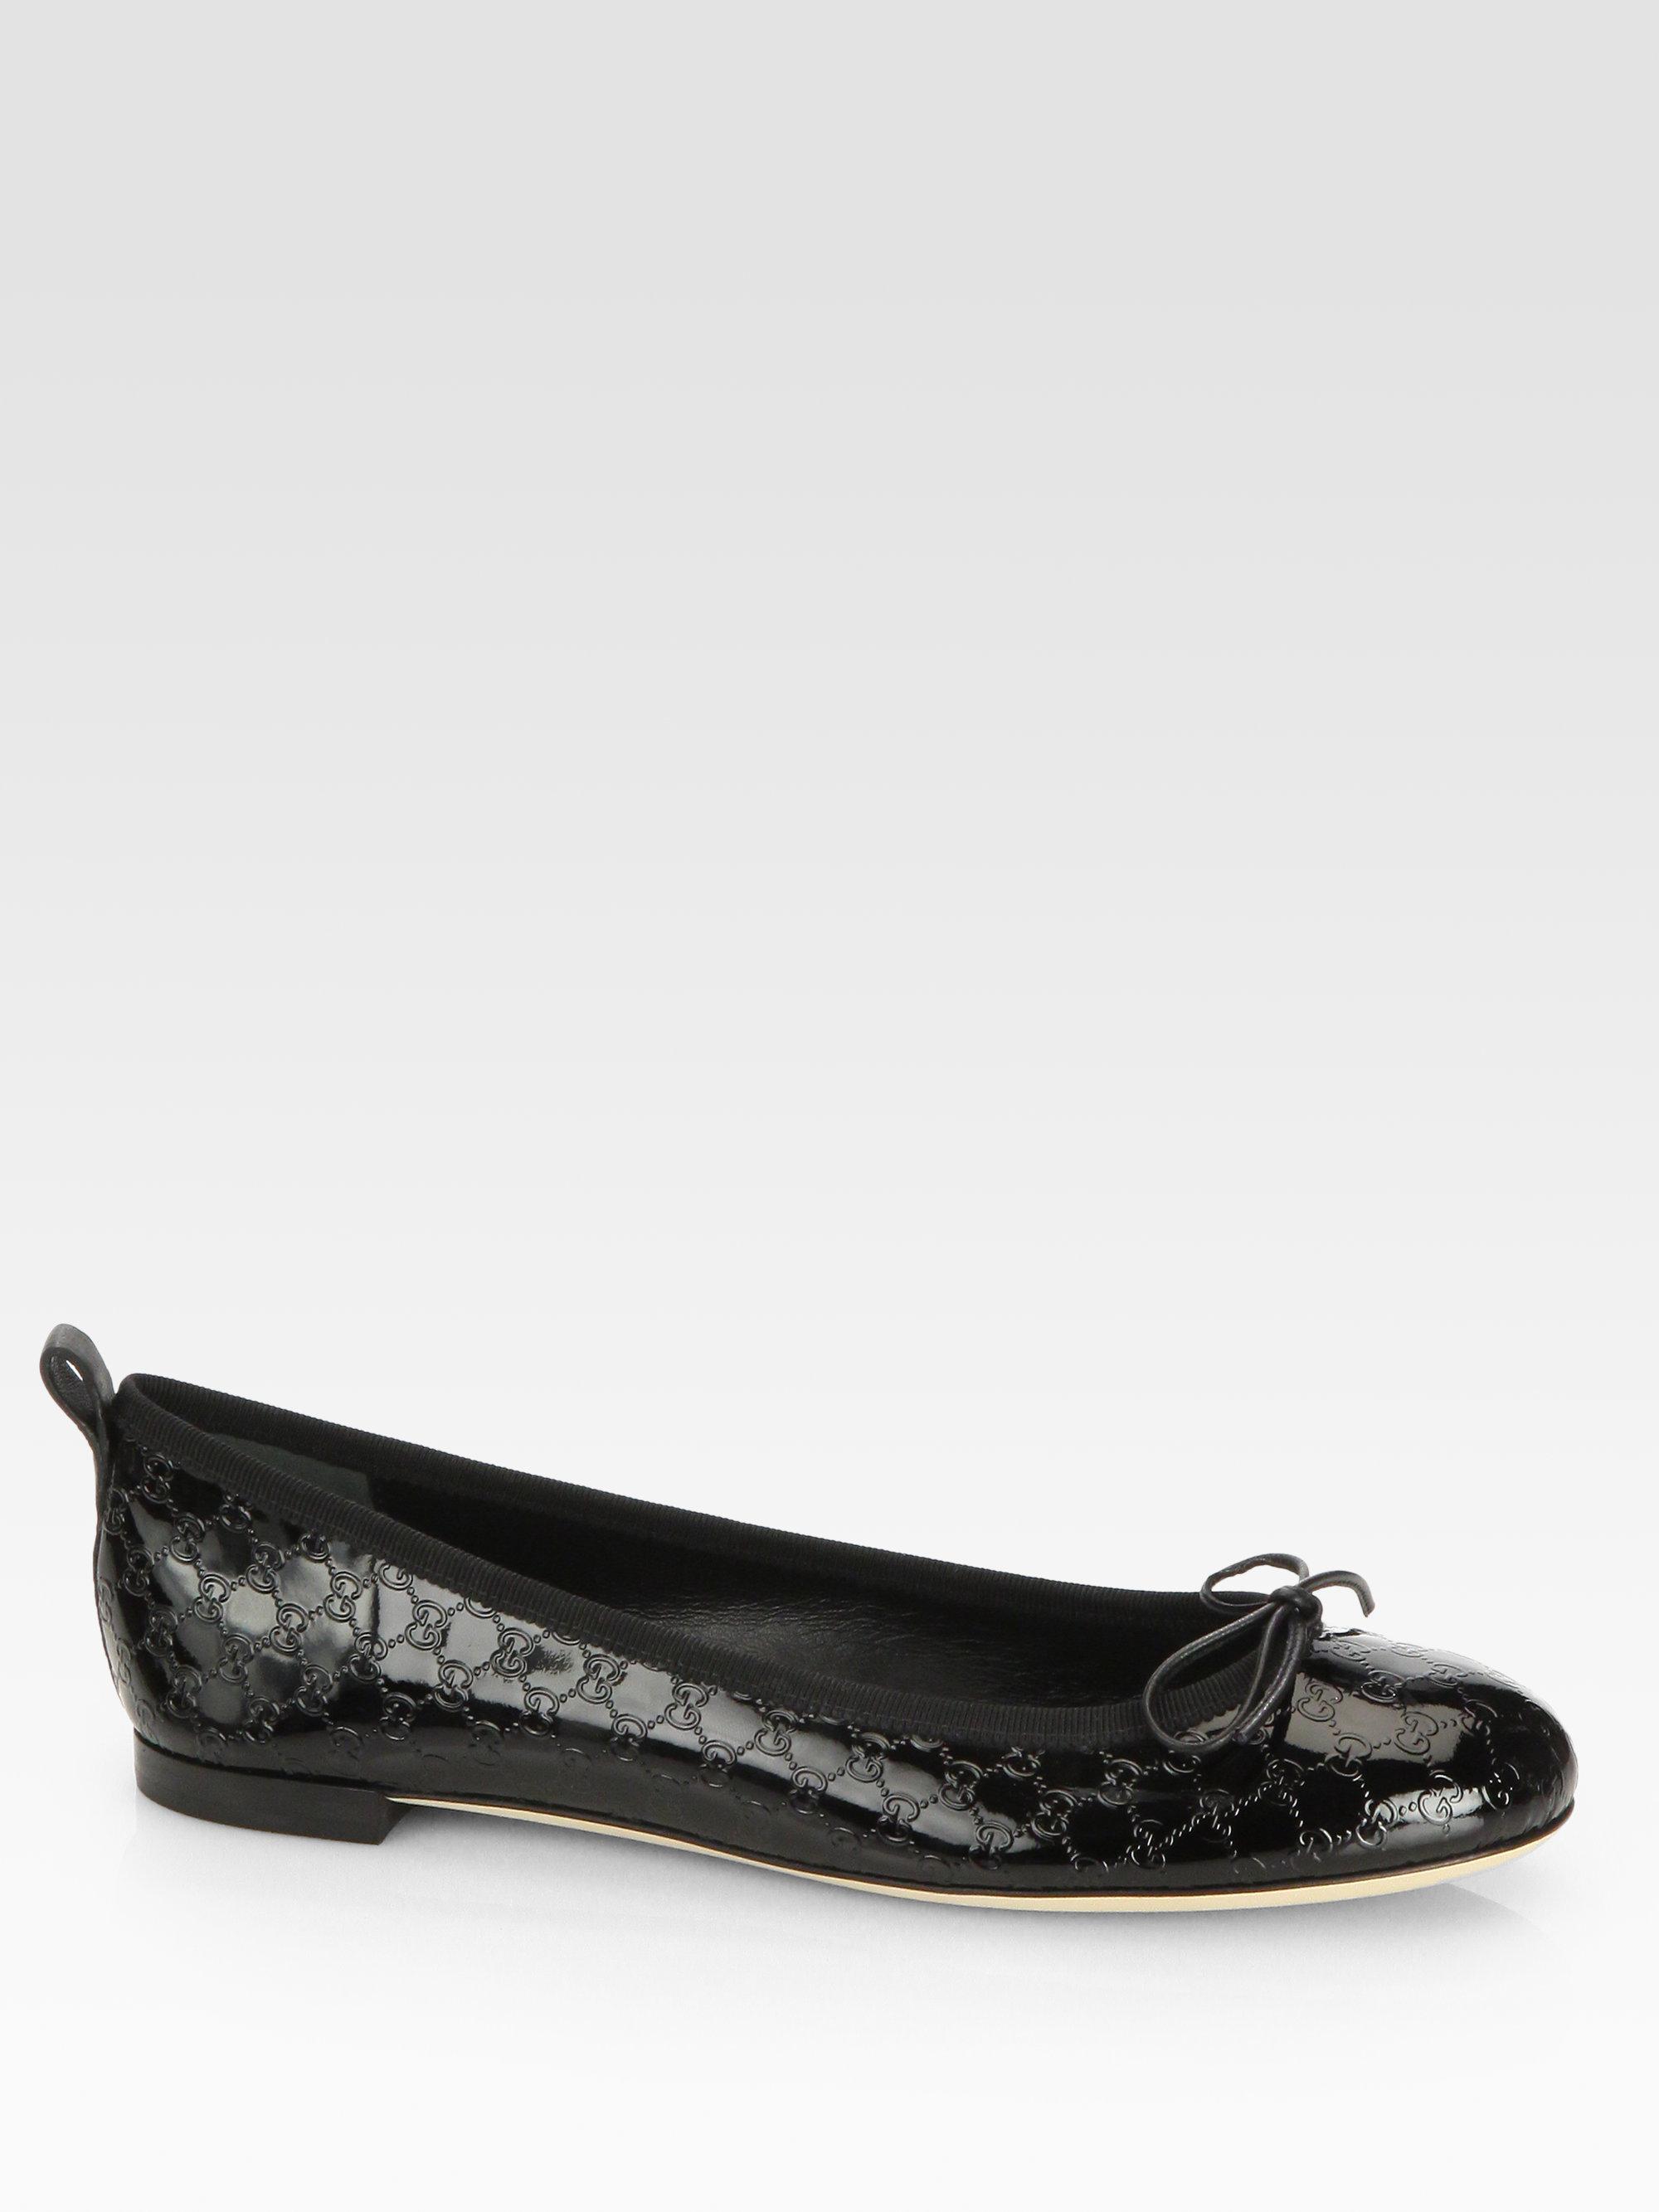 GucciPatent Leather Flats YBdYlwh39